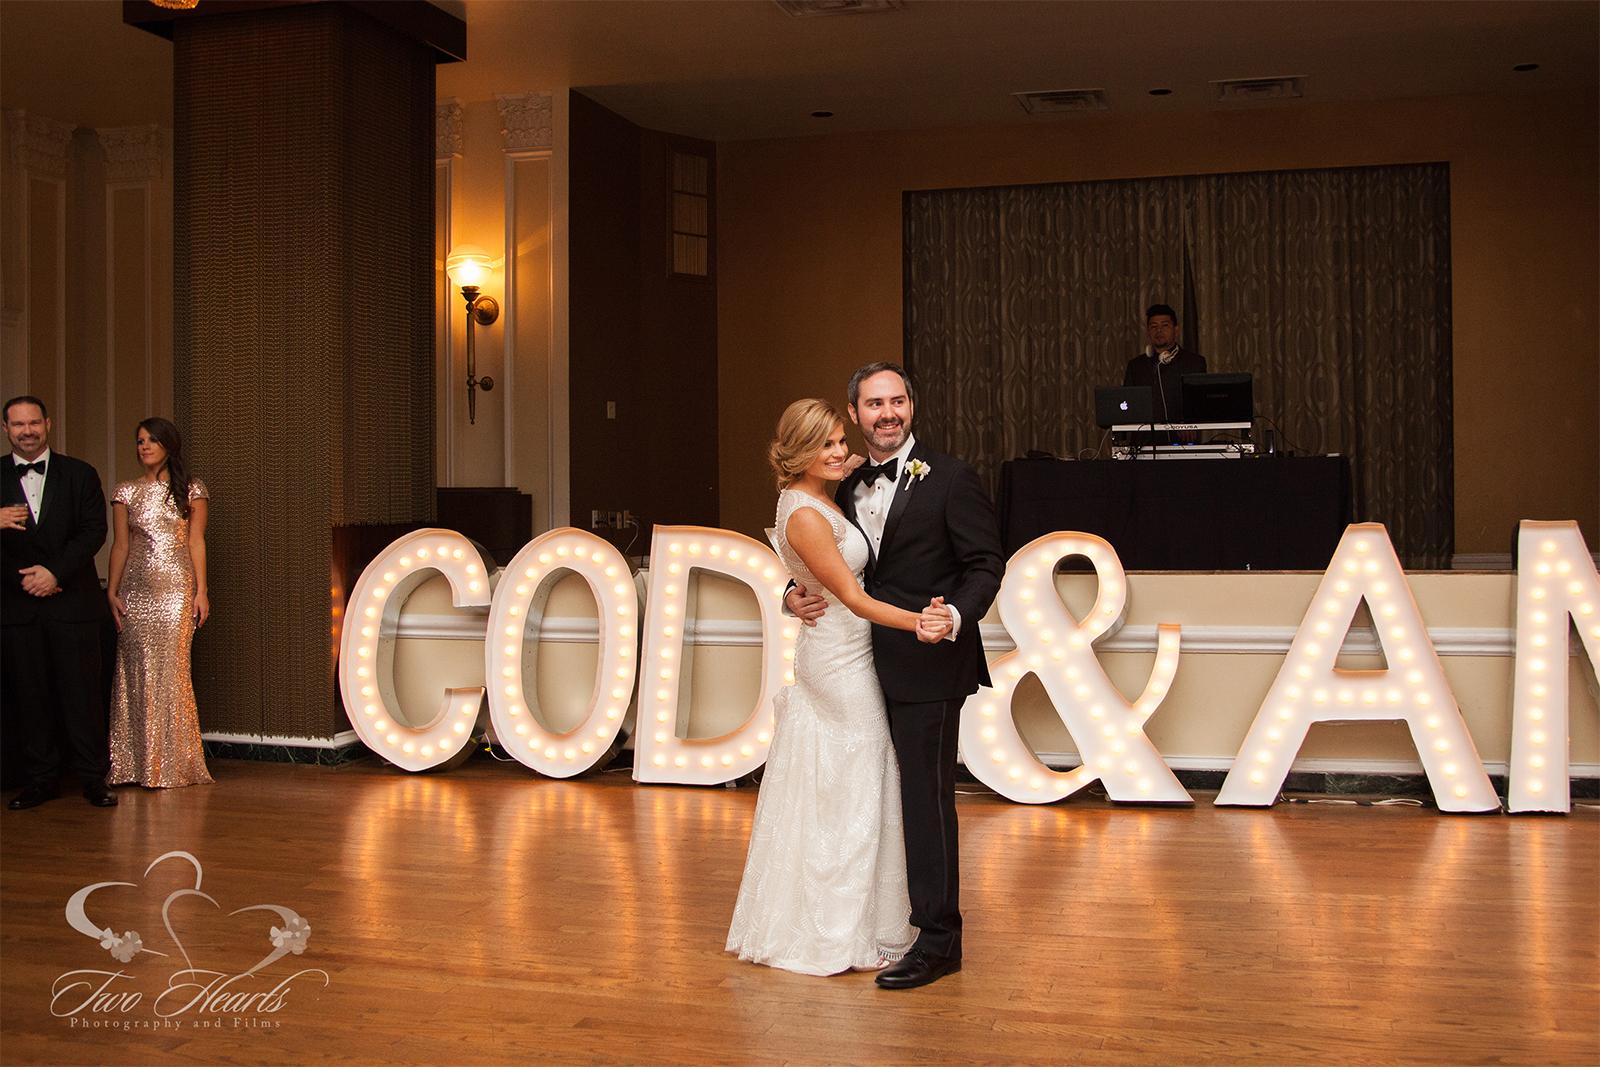 Amy & Cody - Downtown Houston Wedding Photographers